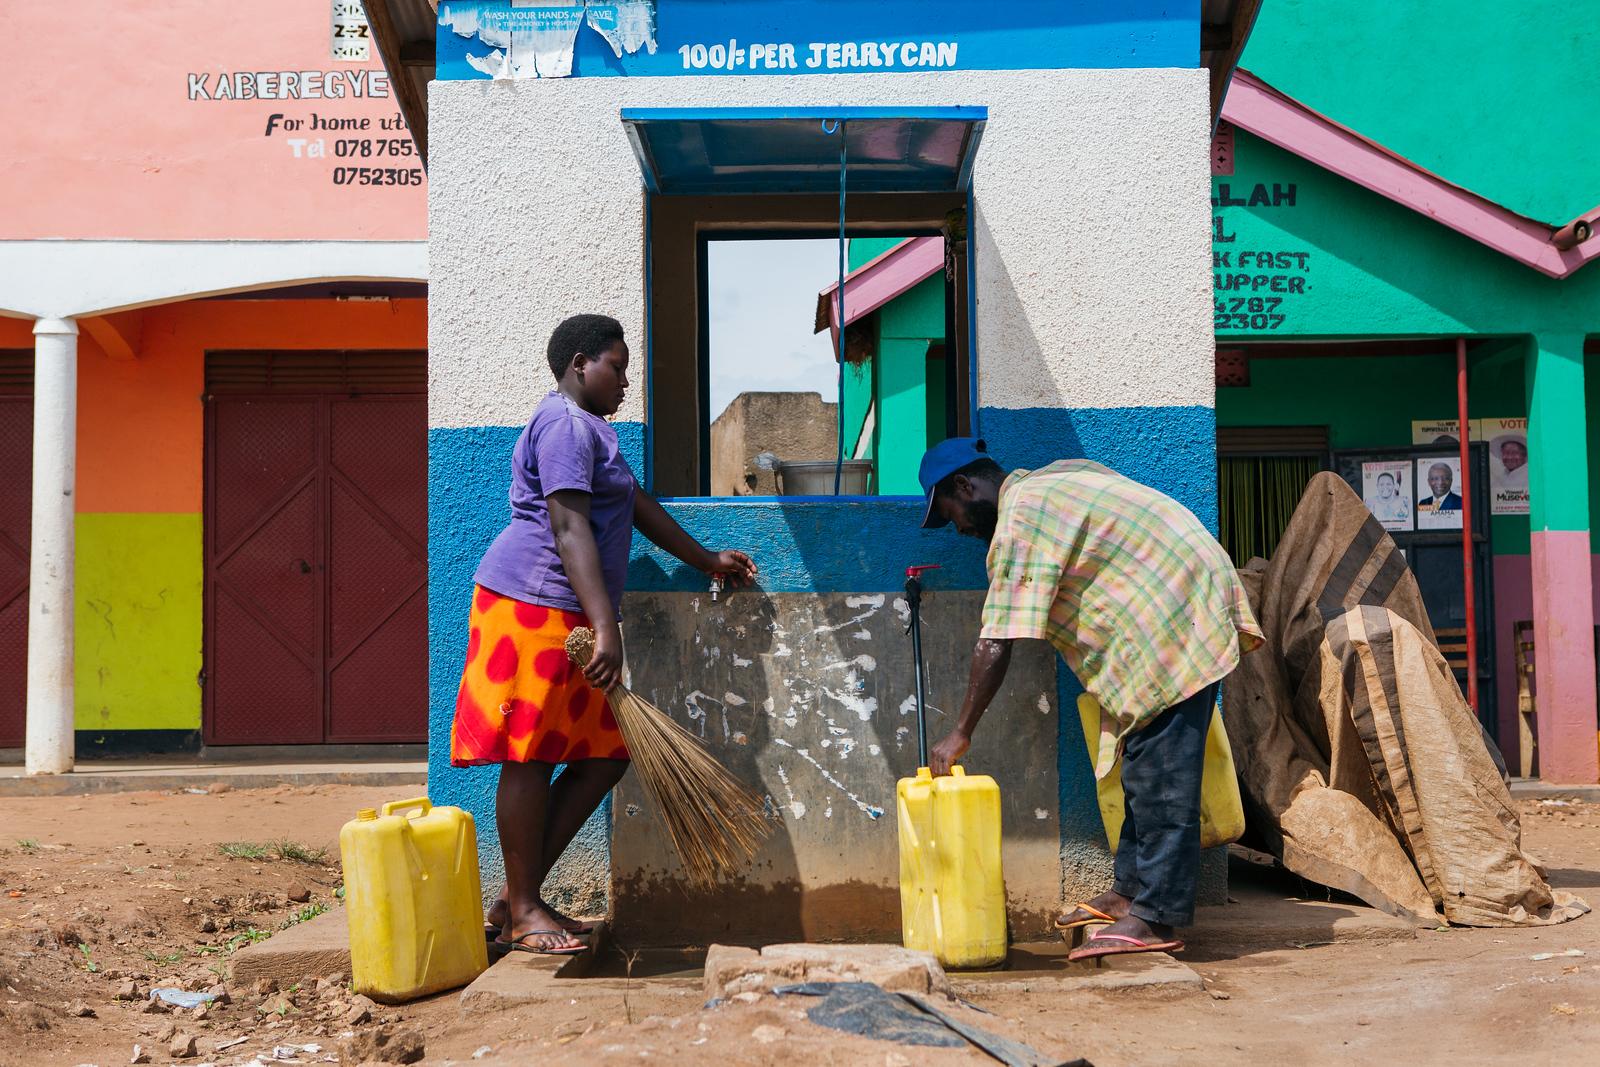 A community water kiosk in Kamwenge, Uganda.